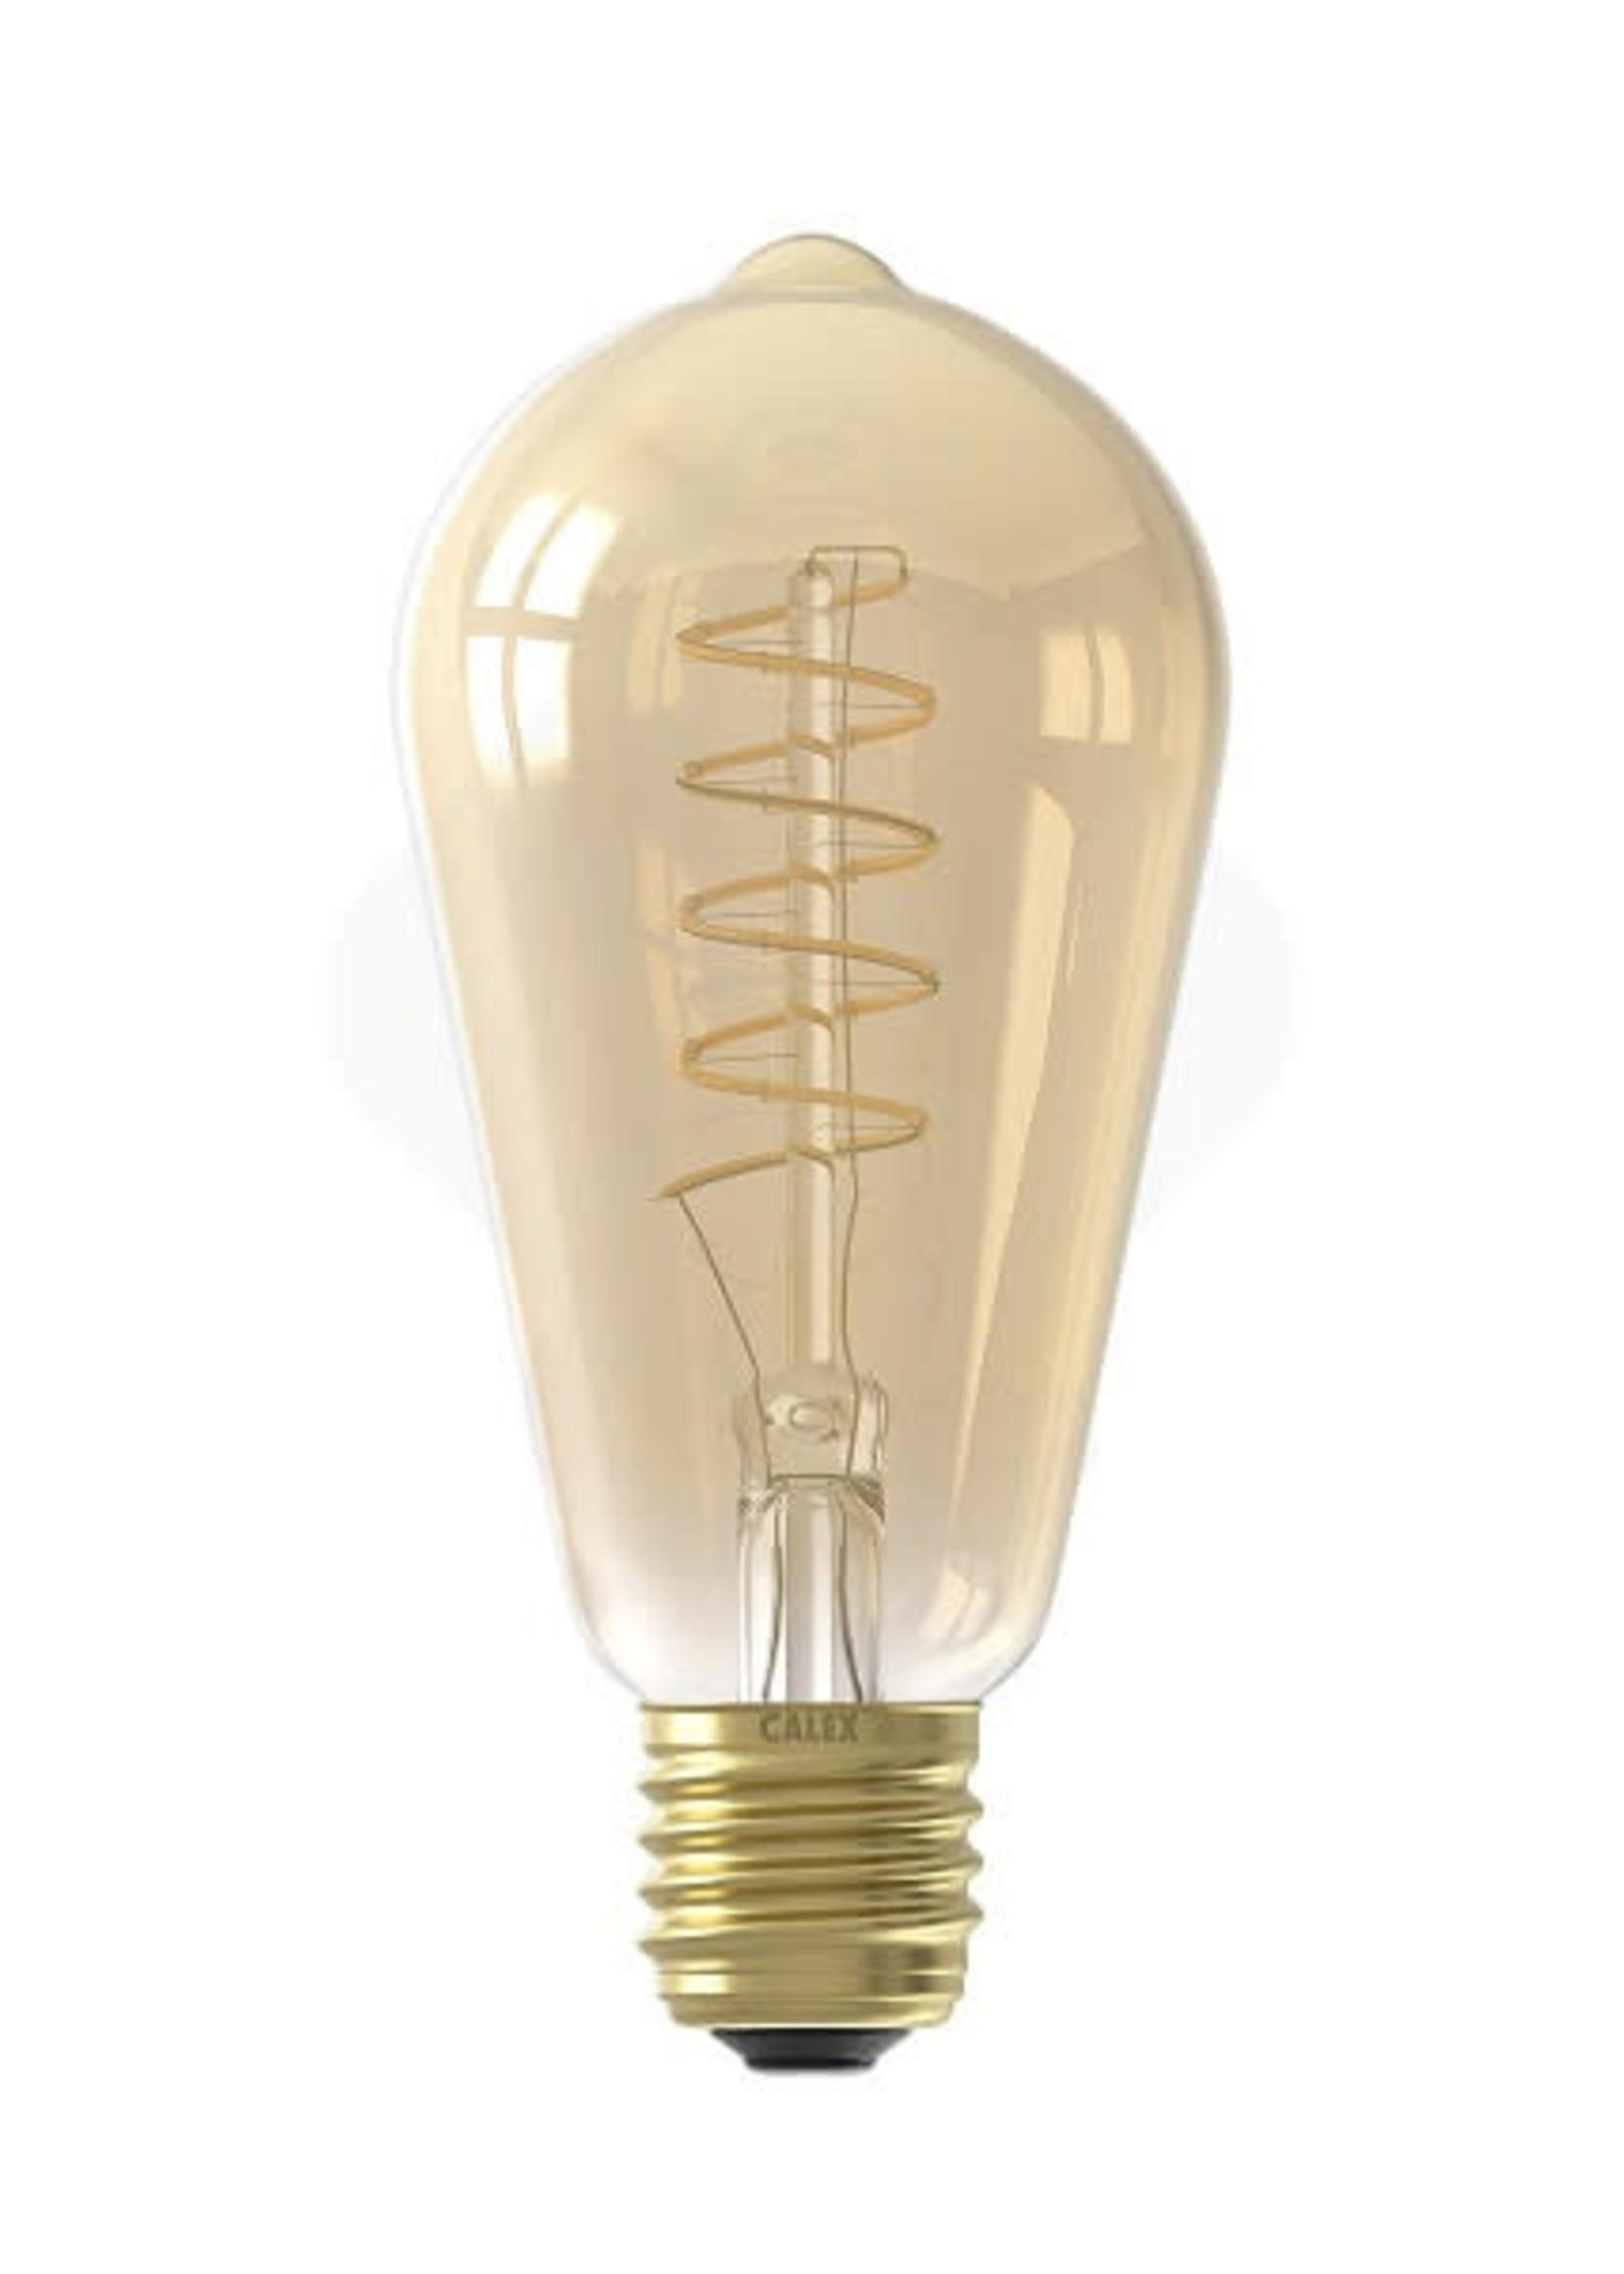 Calex Calex LED volglas Flex Filament Rustieklamp 220-240V 4W 200lm E27 ST64, Goud 2100K Dimbaar, energielabel A